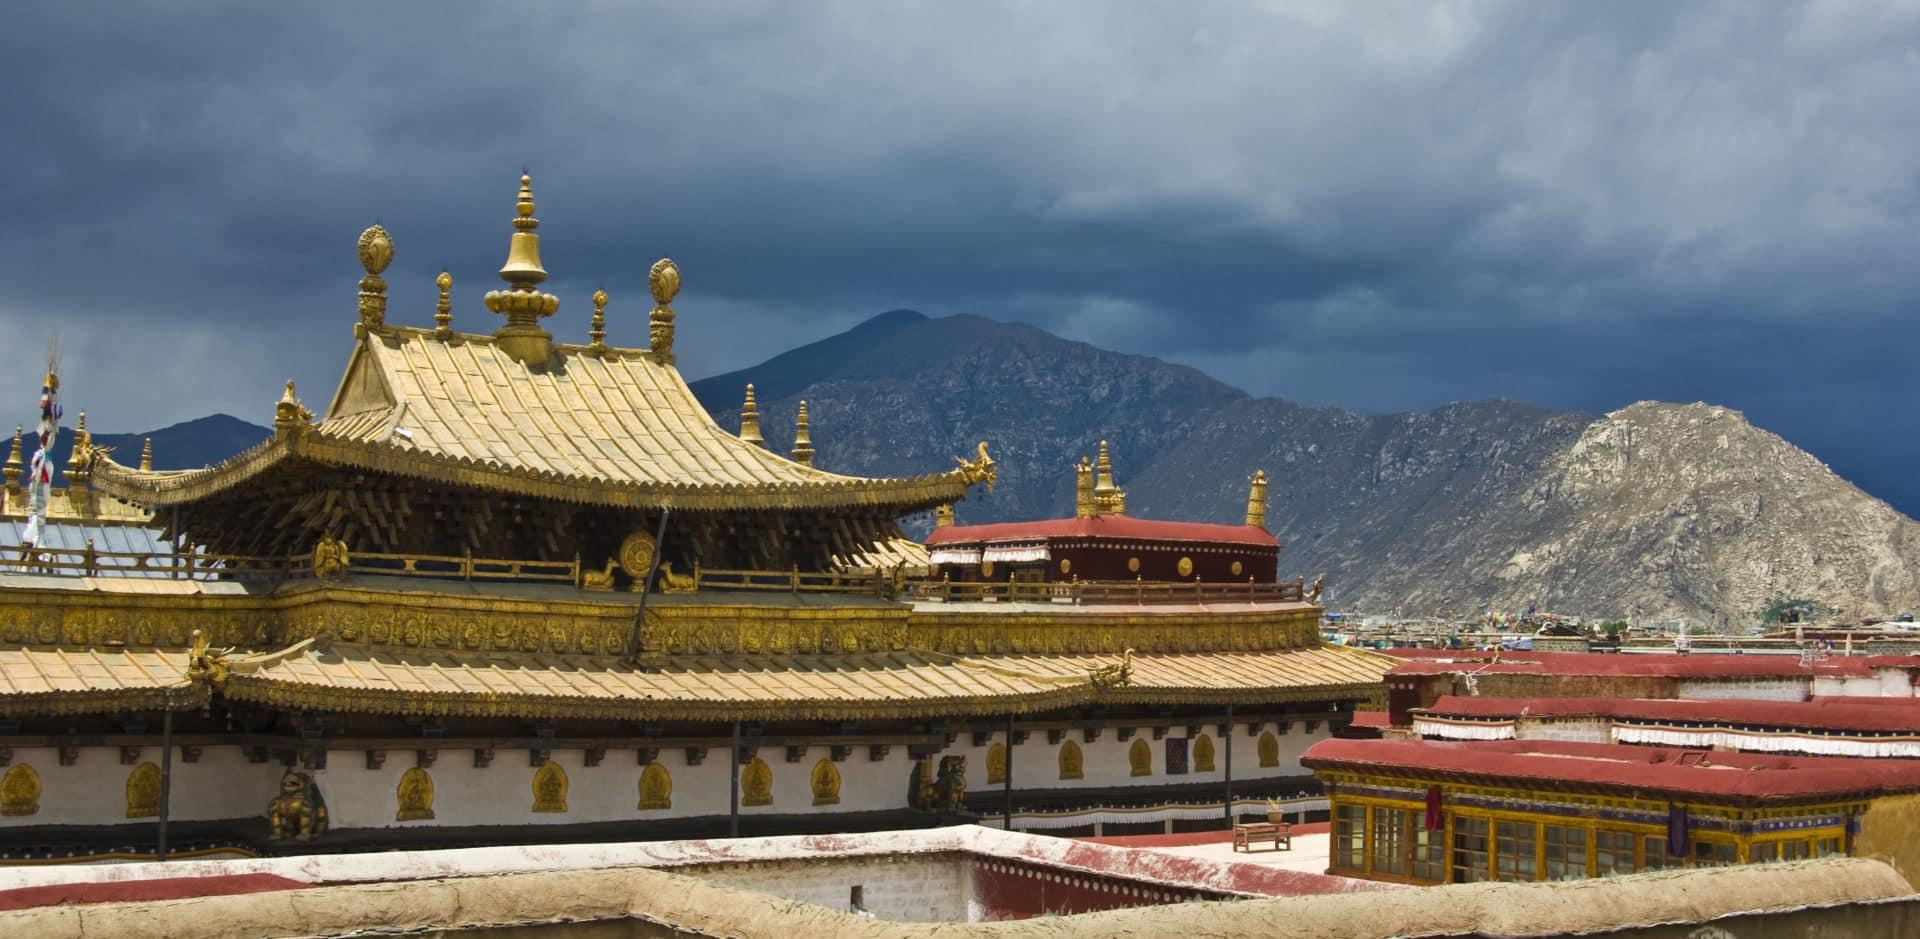 Guided trekking tours across Tibet